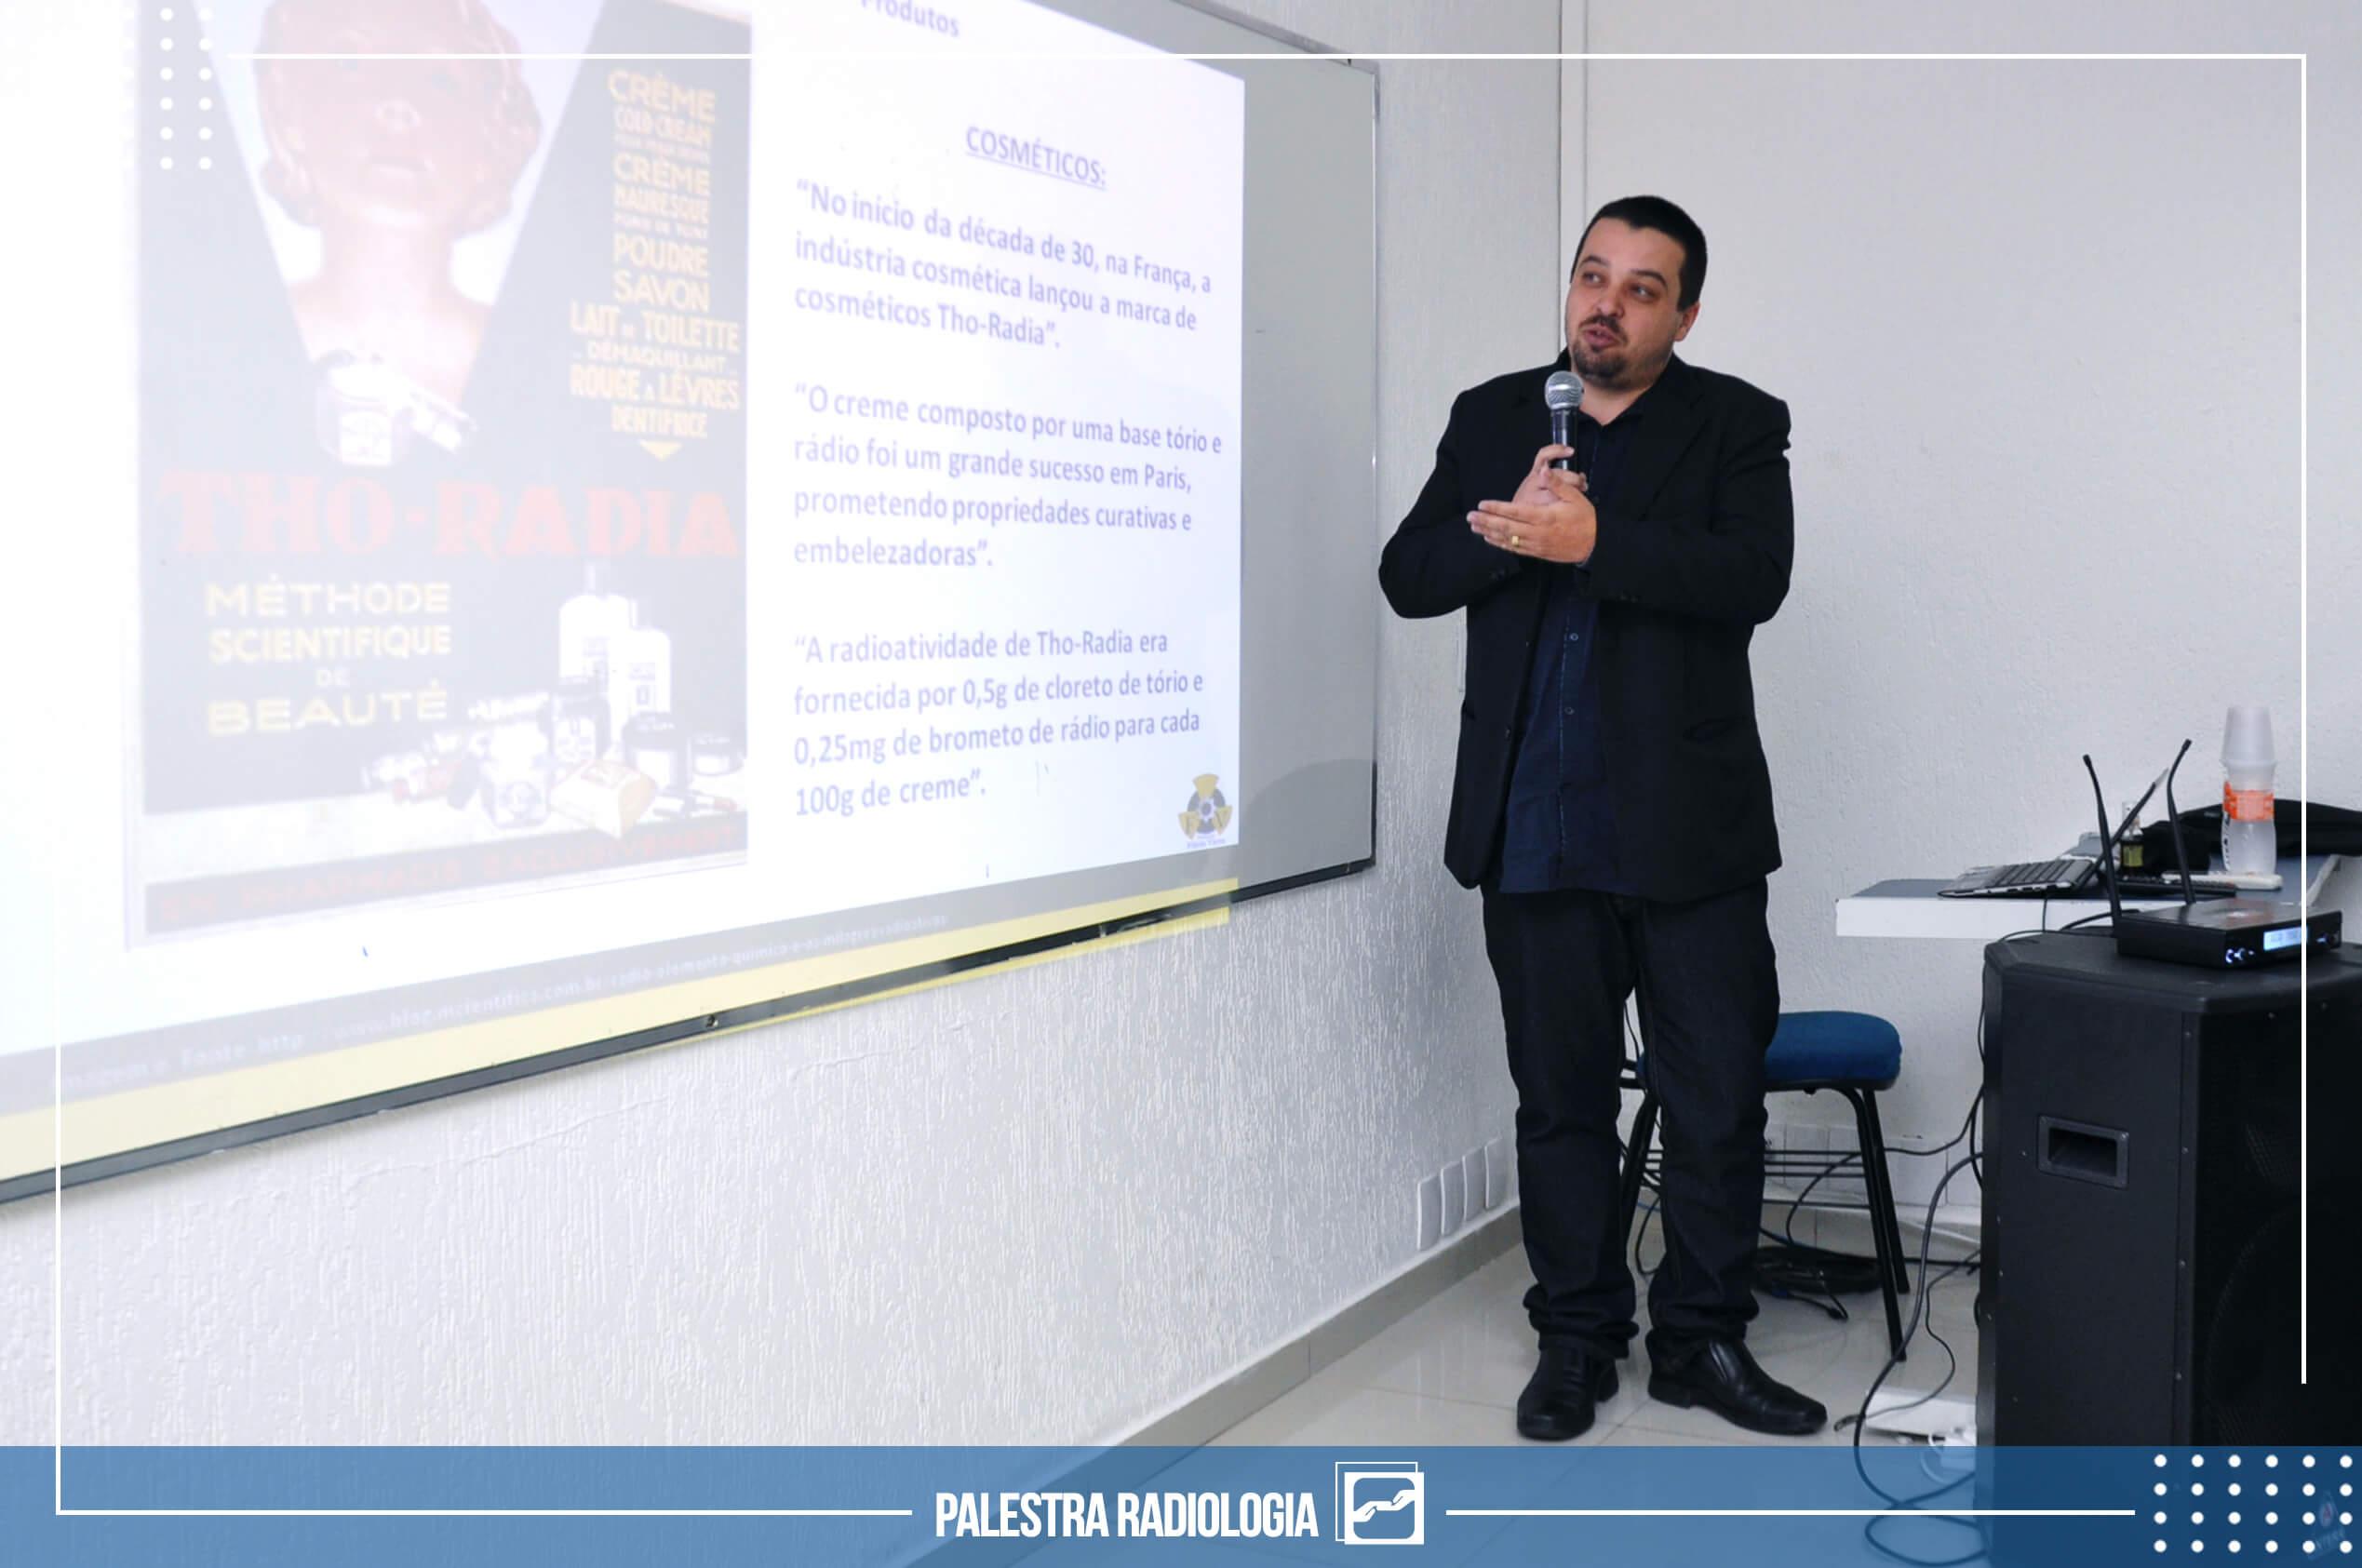 palestra-radiologia-famesp-2019